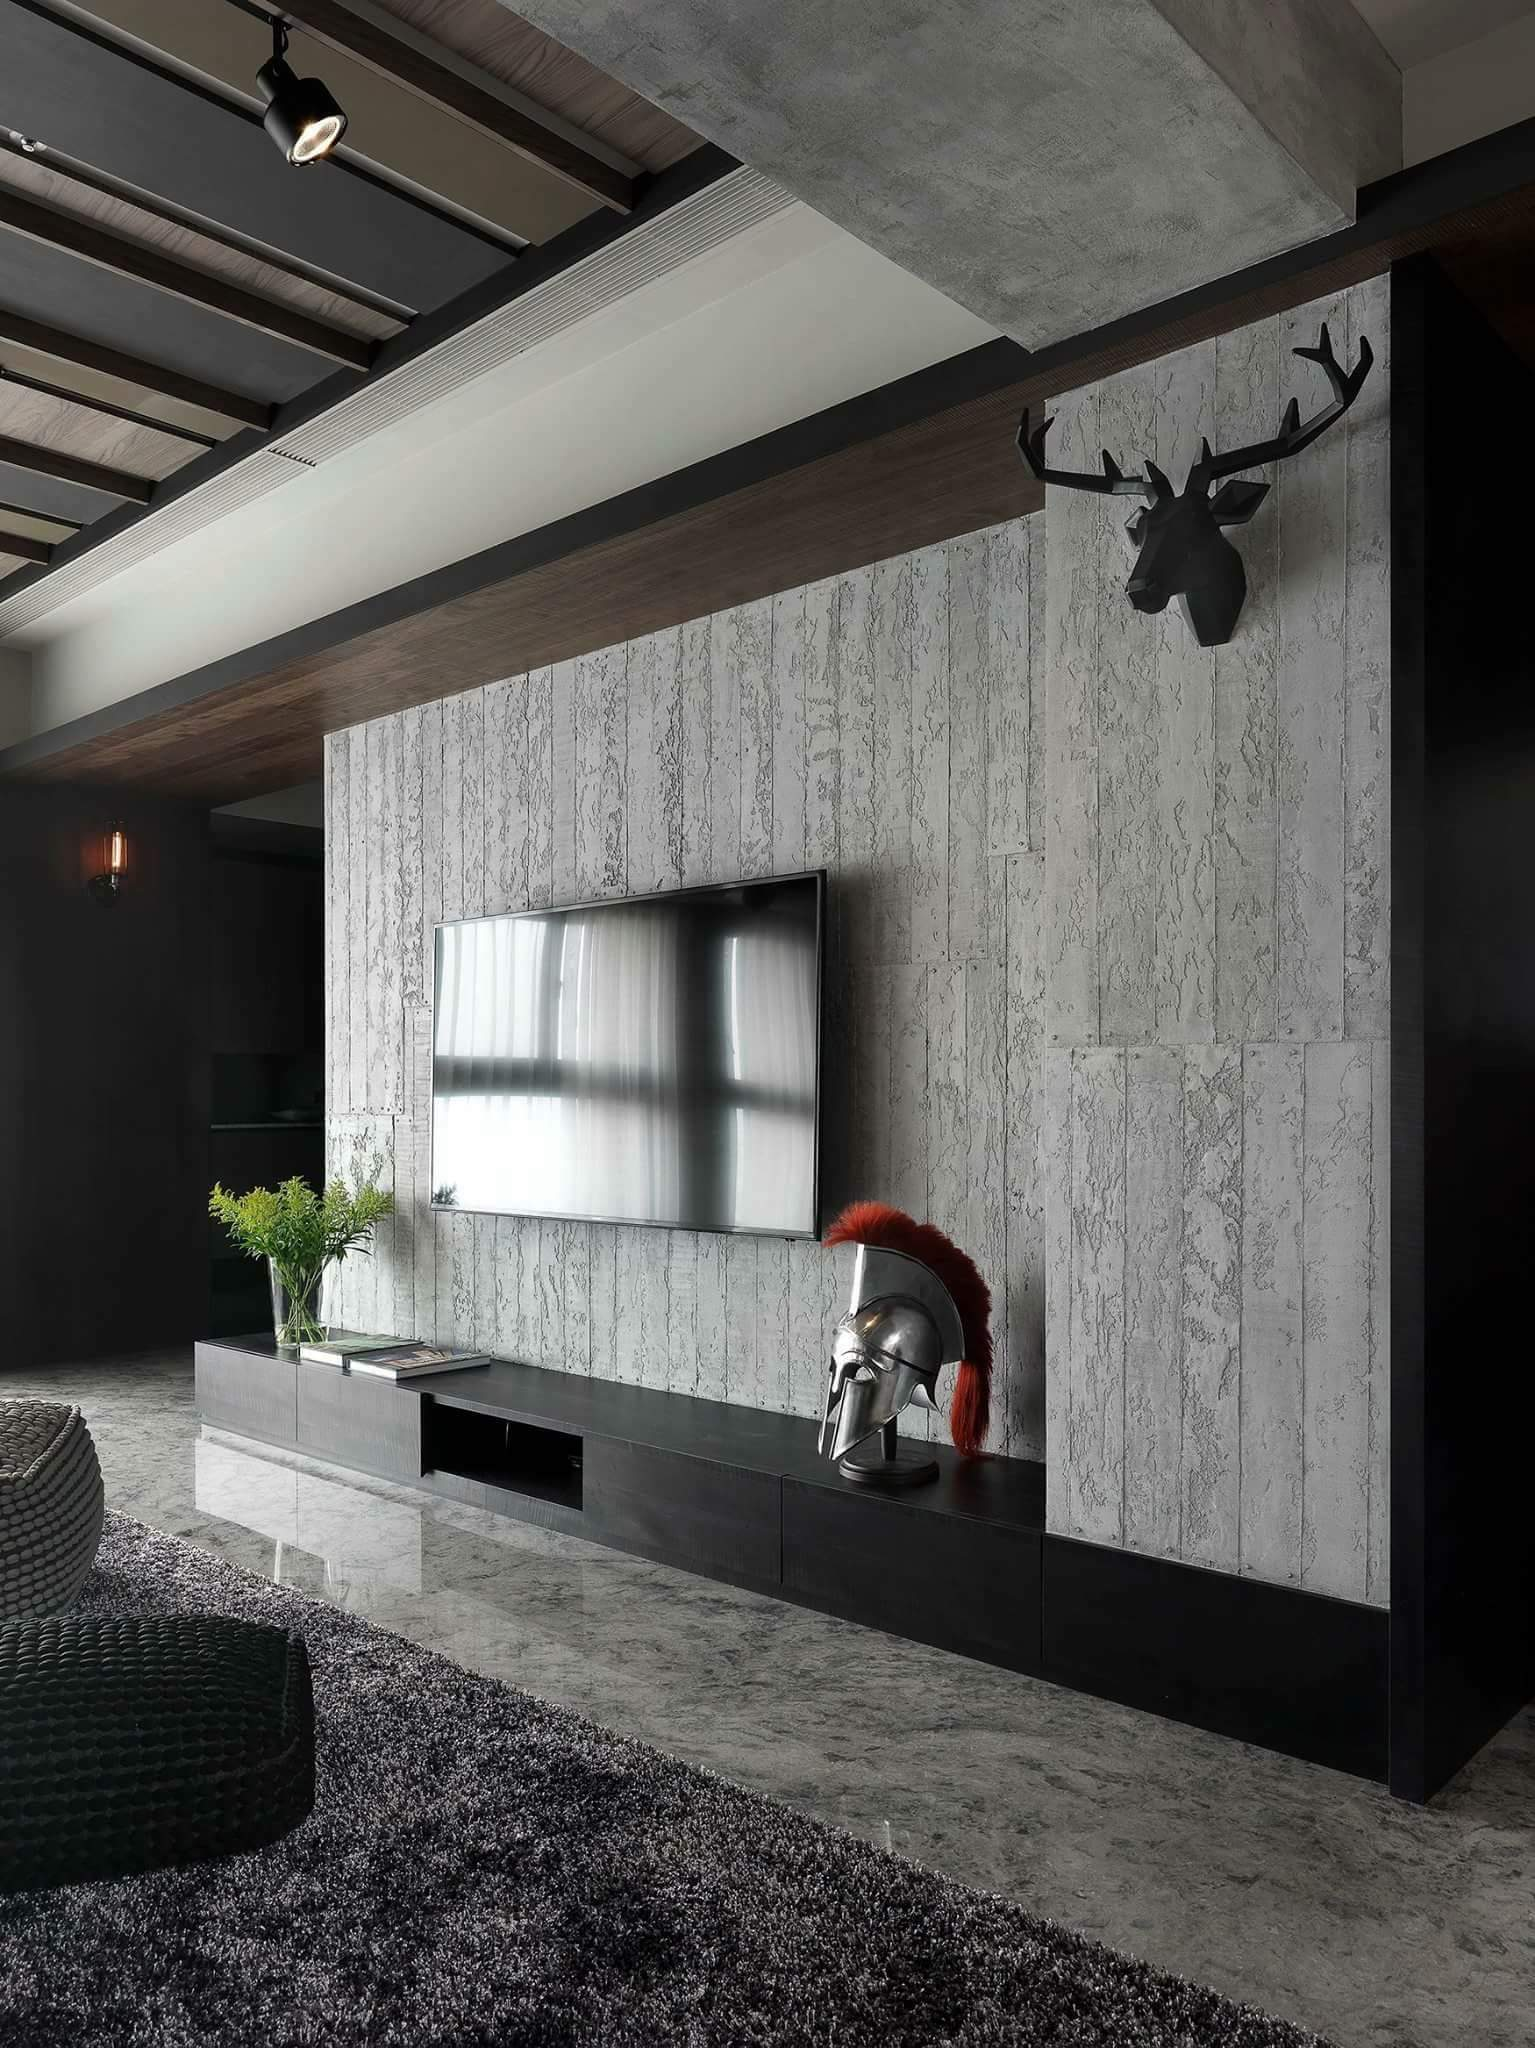 Novacolor Archi+ Concrete -sisustuslaasti, olohuone televisioseinä